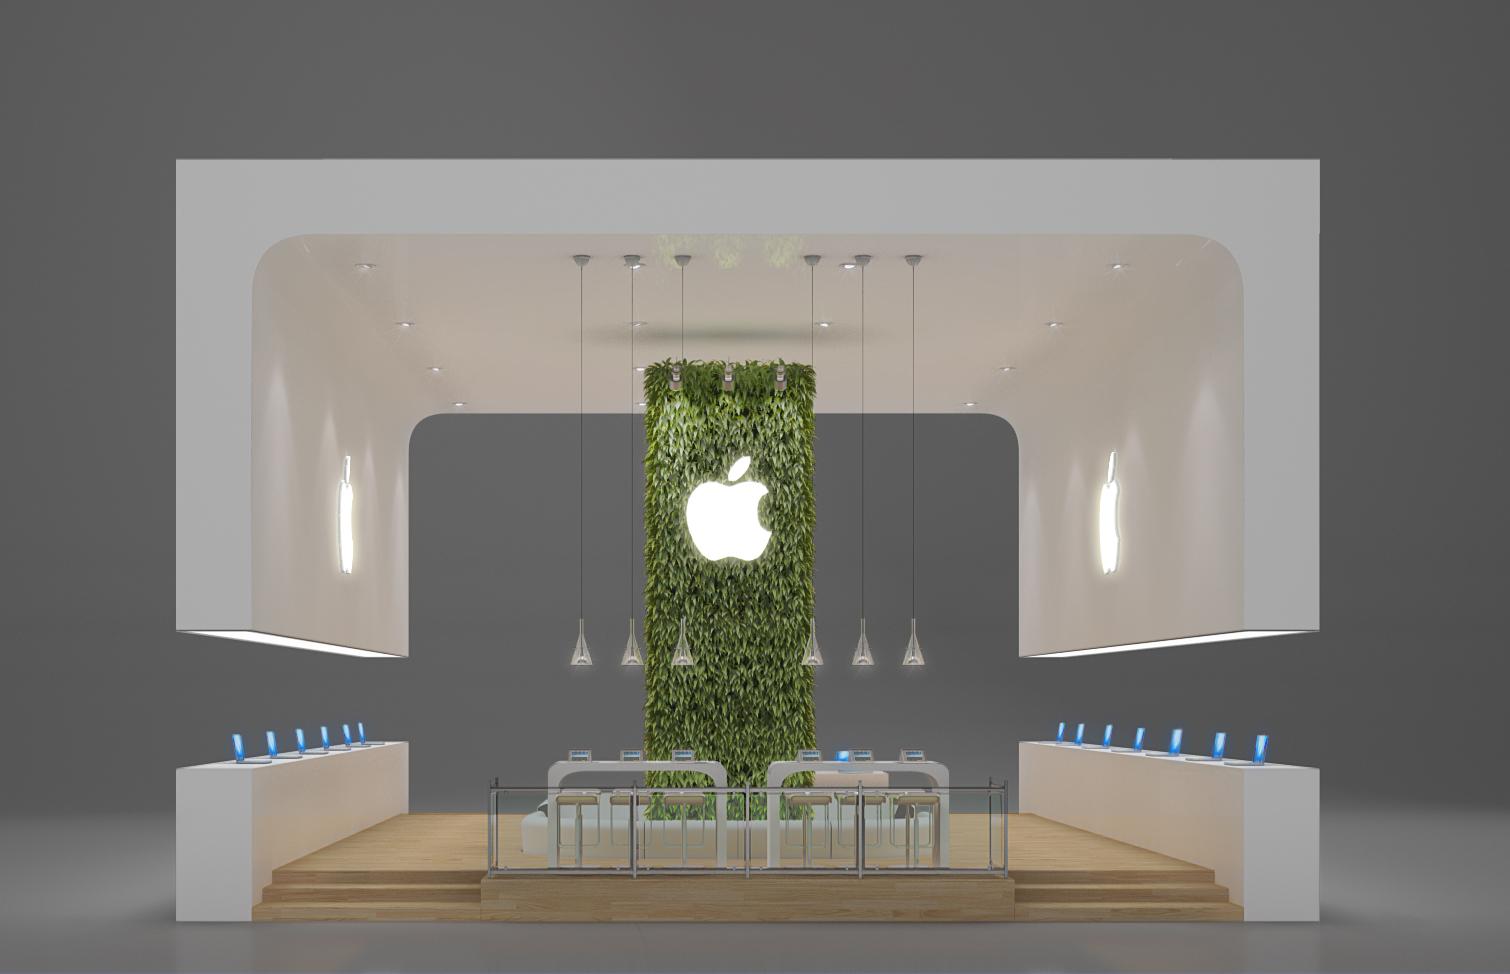 Exhibition Stand Minimalist : Exhibition design apple by leticia velasco at coroflot